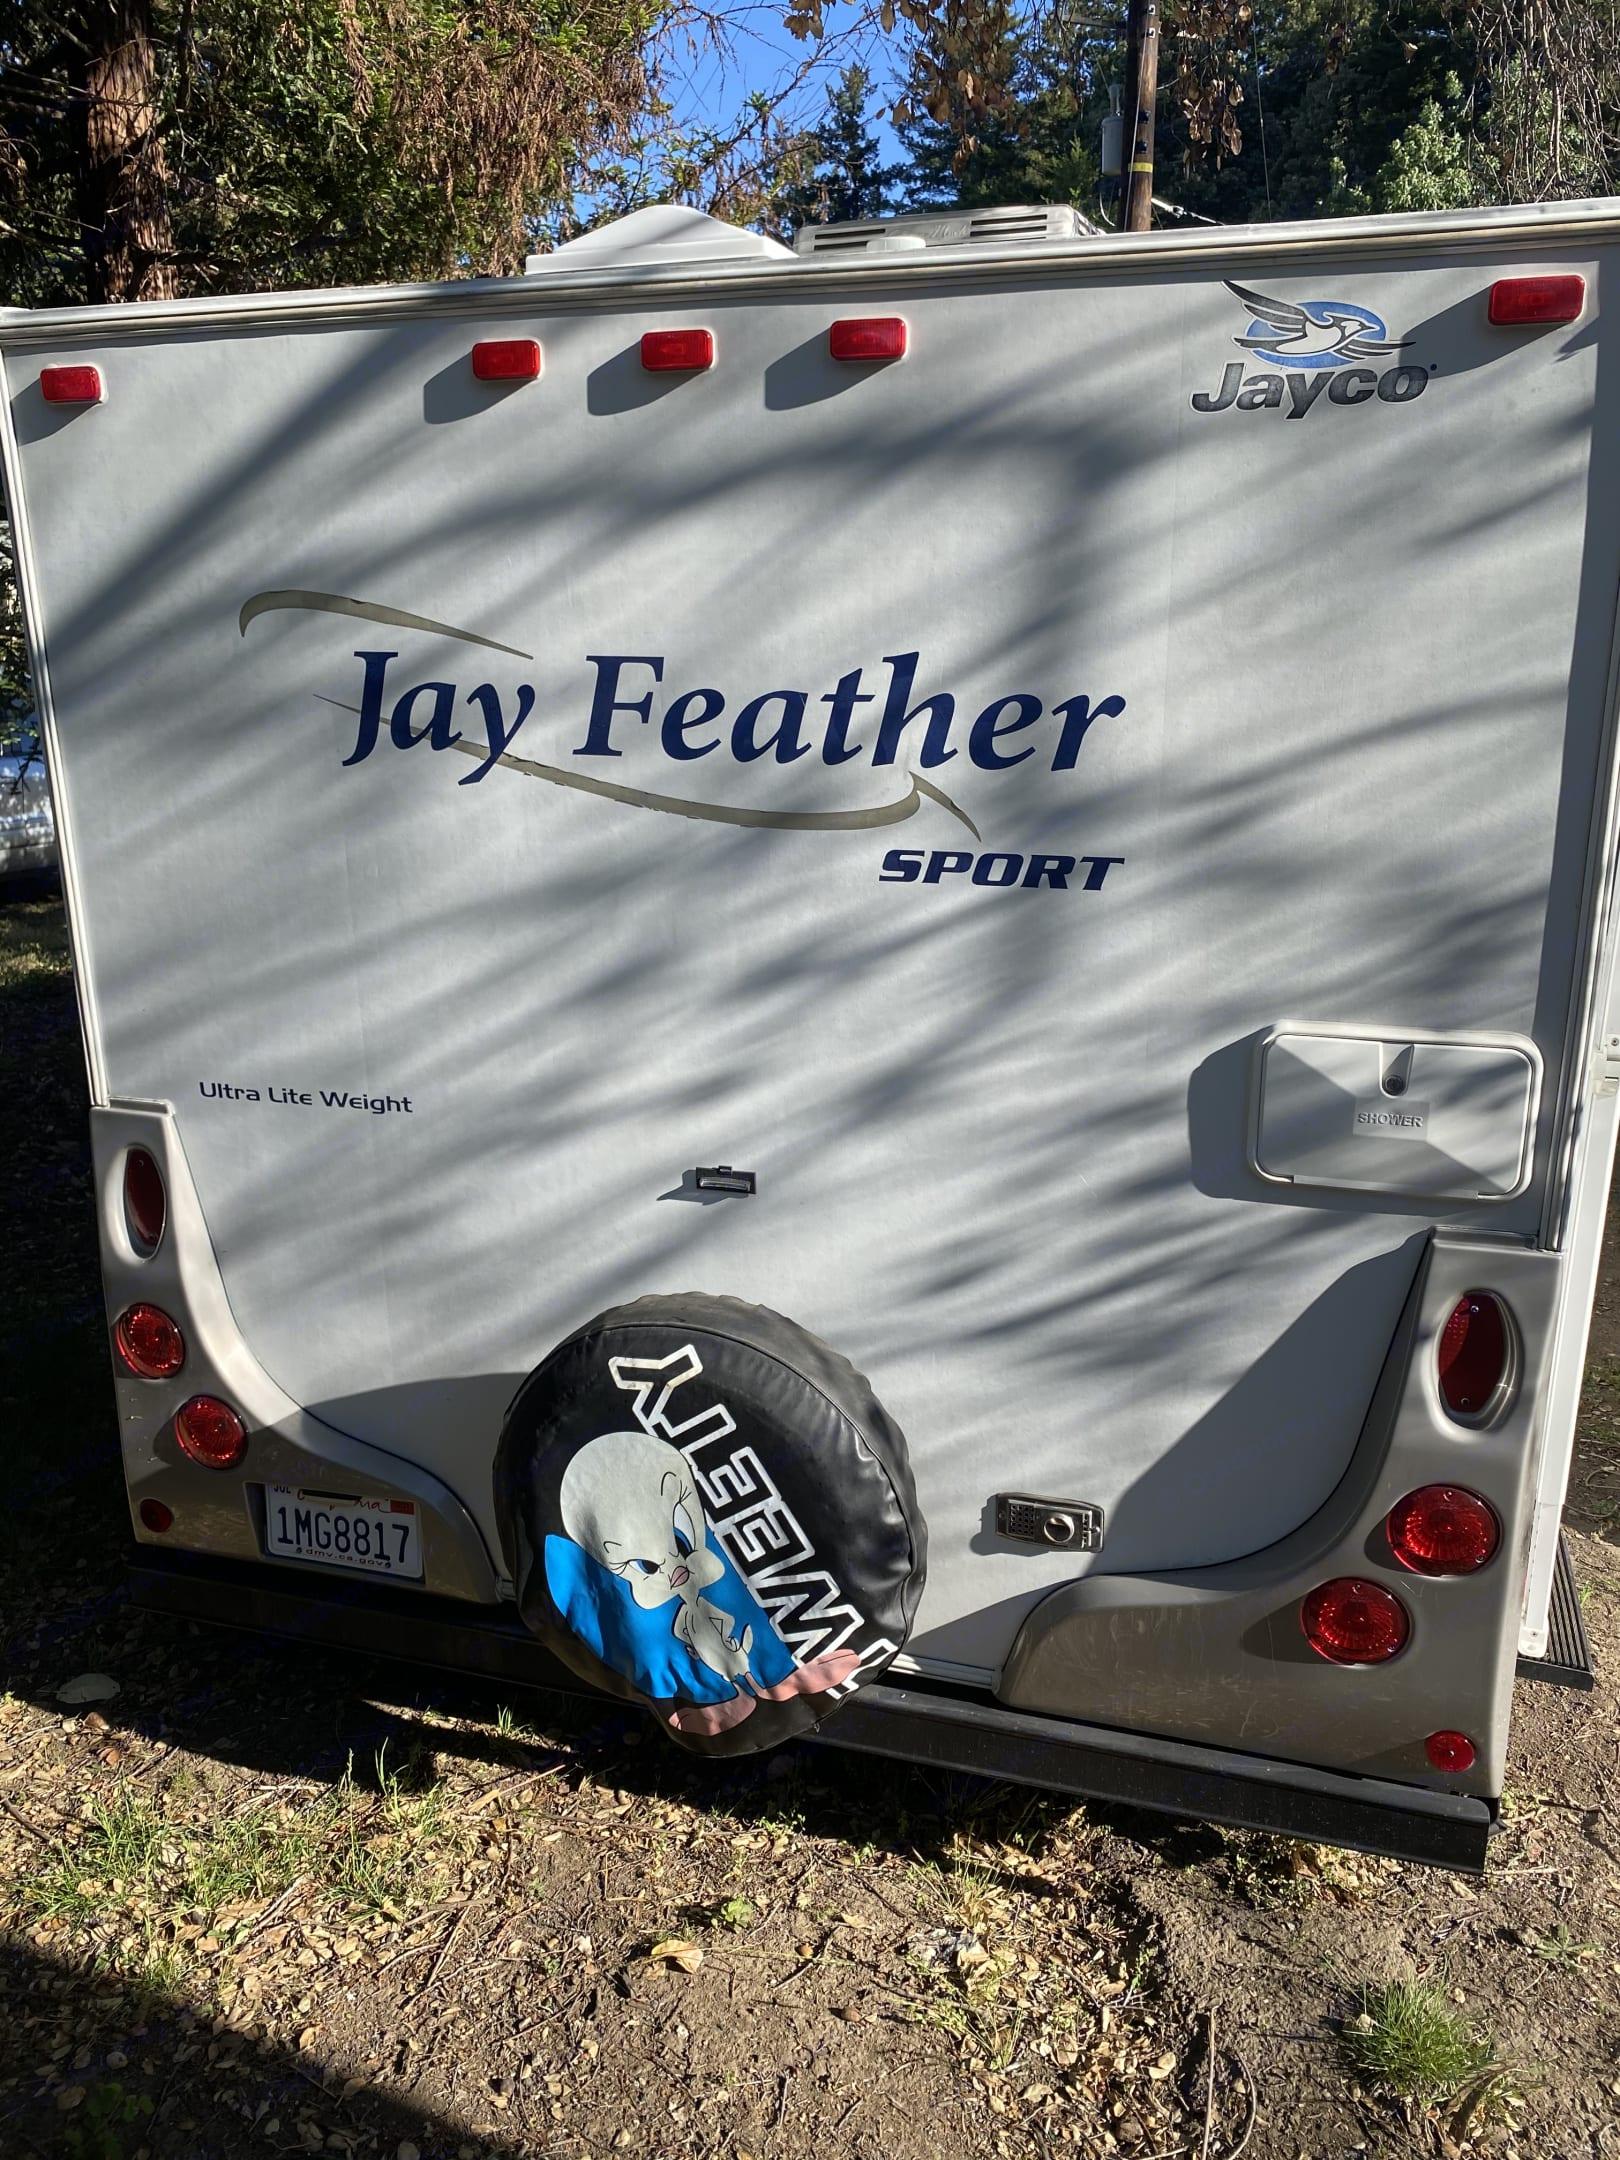 Jayco Jay Feather 2010